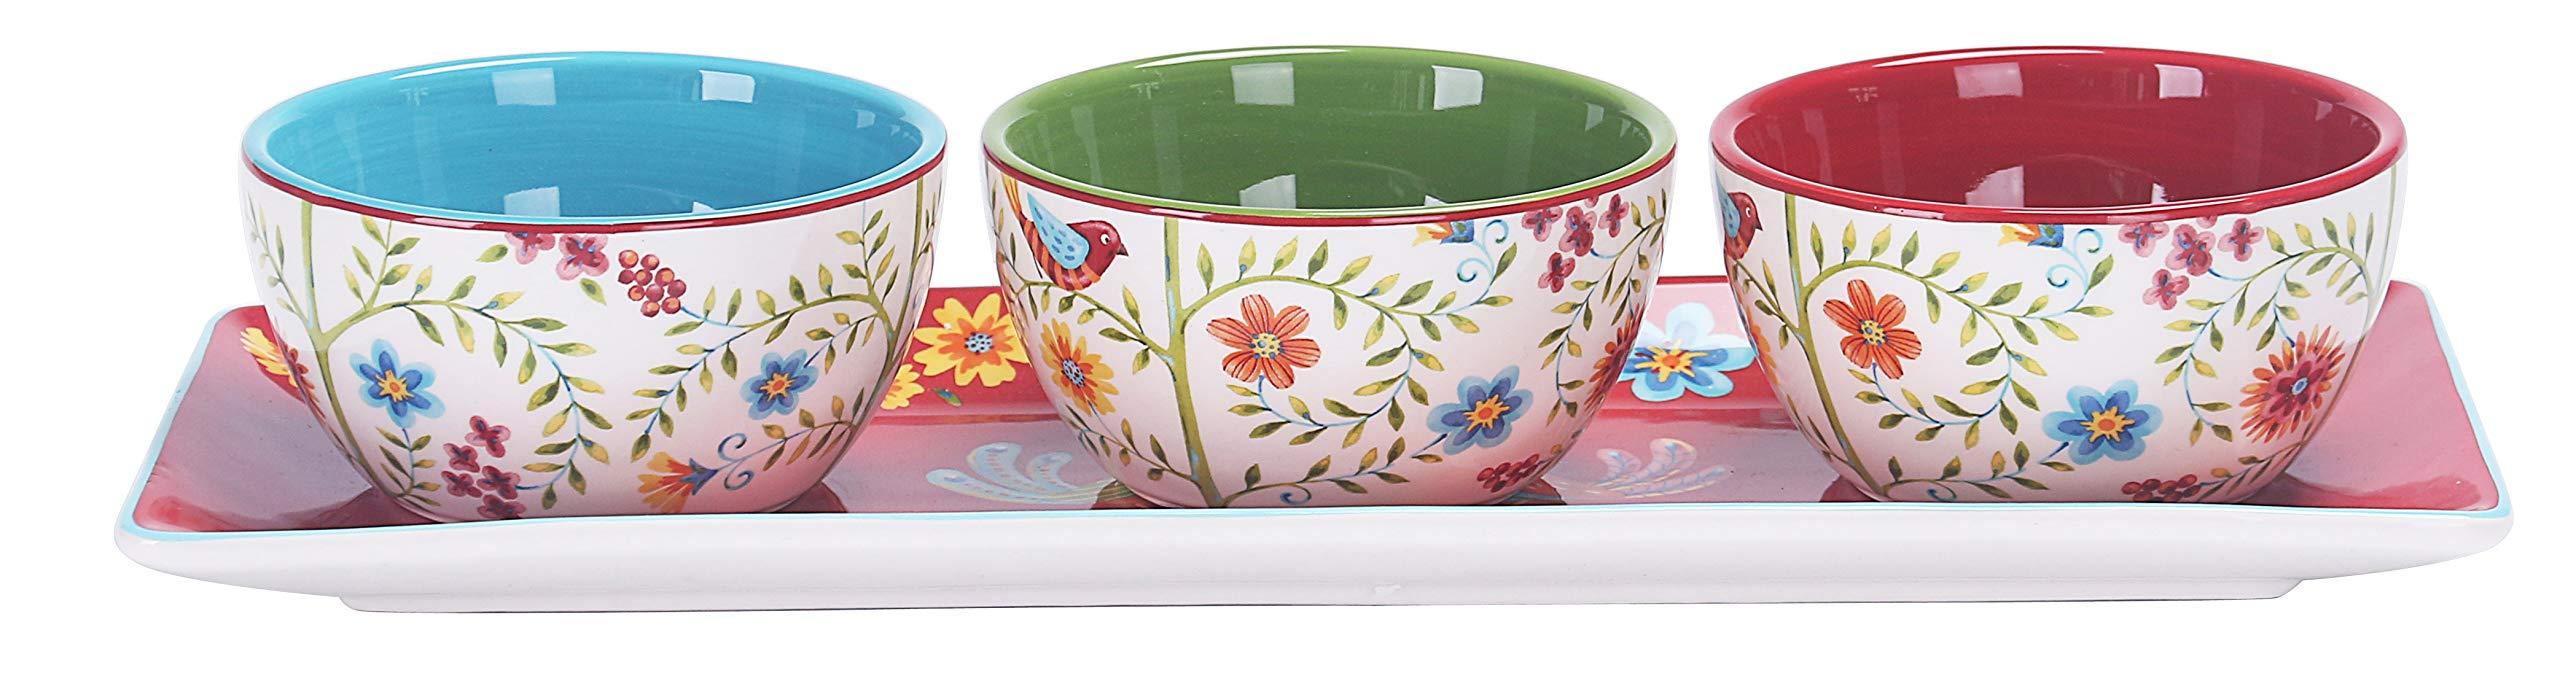 Bico Red Spring Bird Ceramic Dipping Bowl Set (9oz bowls with 14 inch platter), for Sauce, Nachos, Snacks, Microwave & Dishwasher Safe